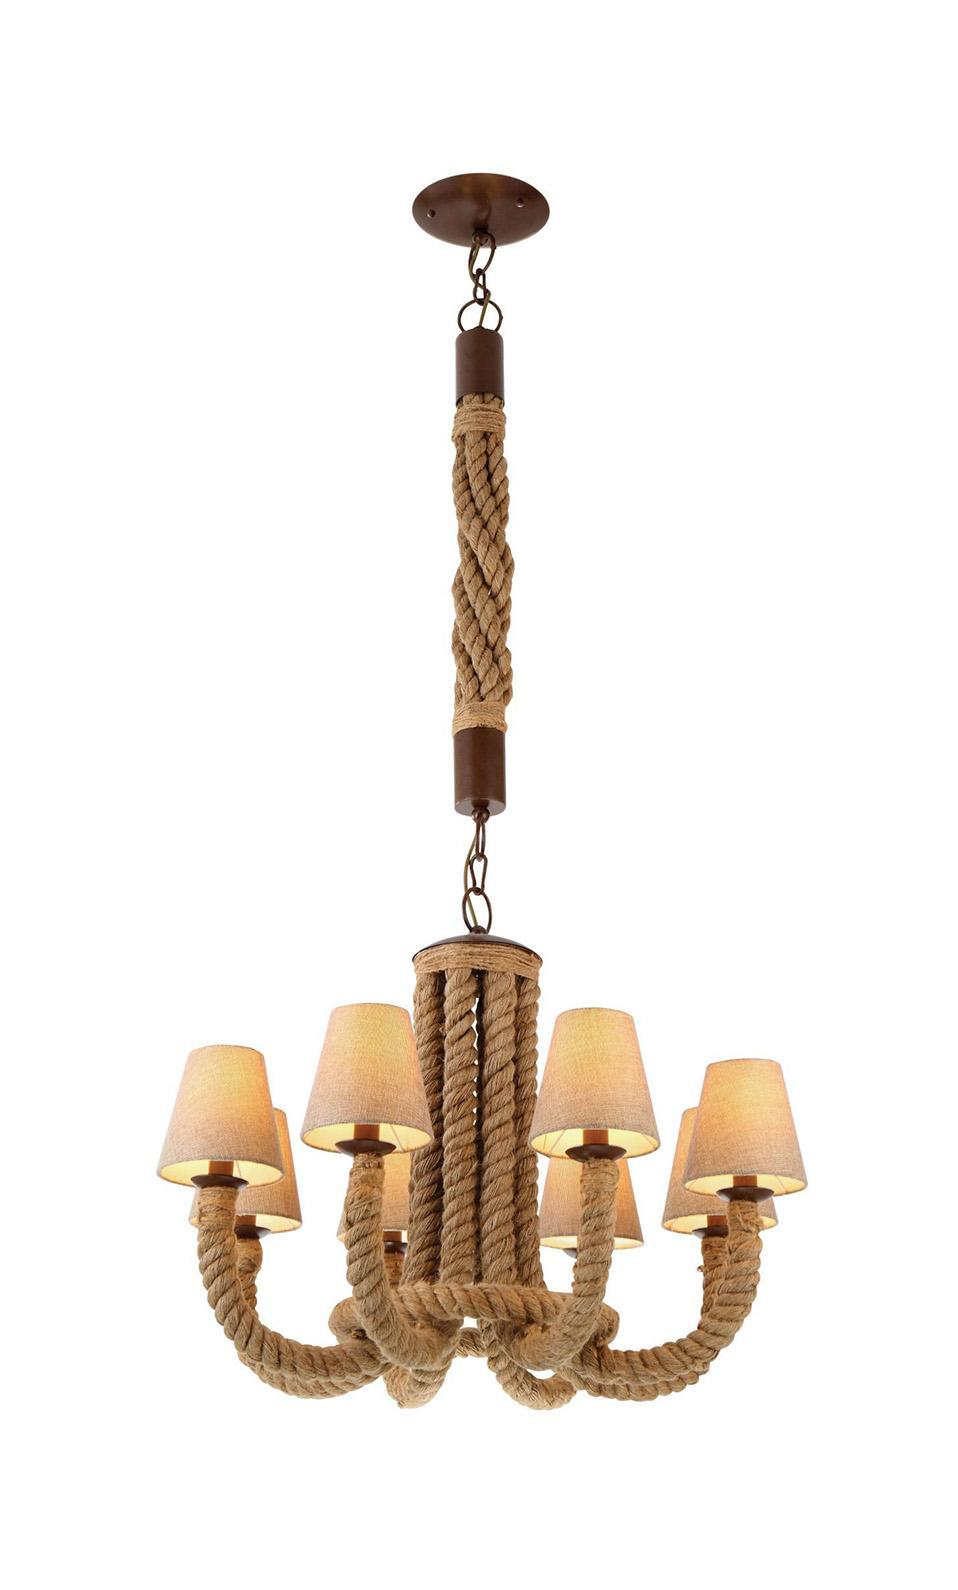 Люстра Arte lamp A8958lm-8br подвесная люстра arte lamp corda a8958lm 5br